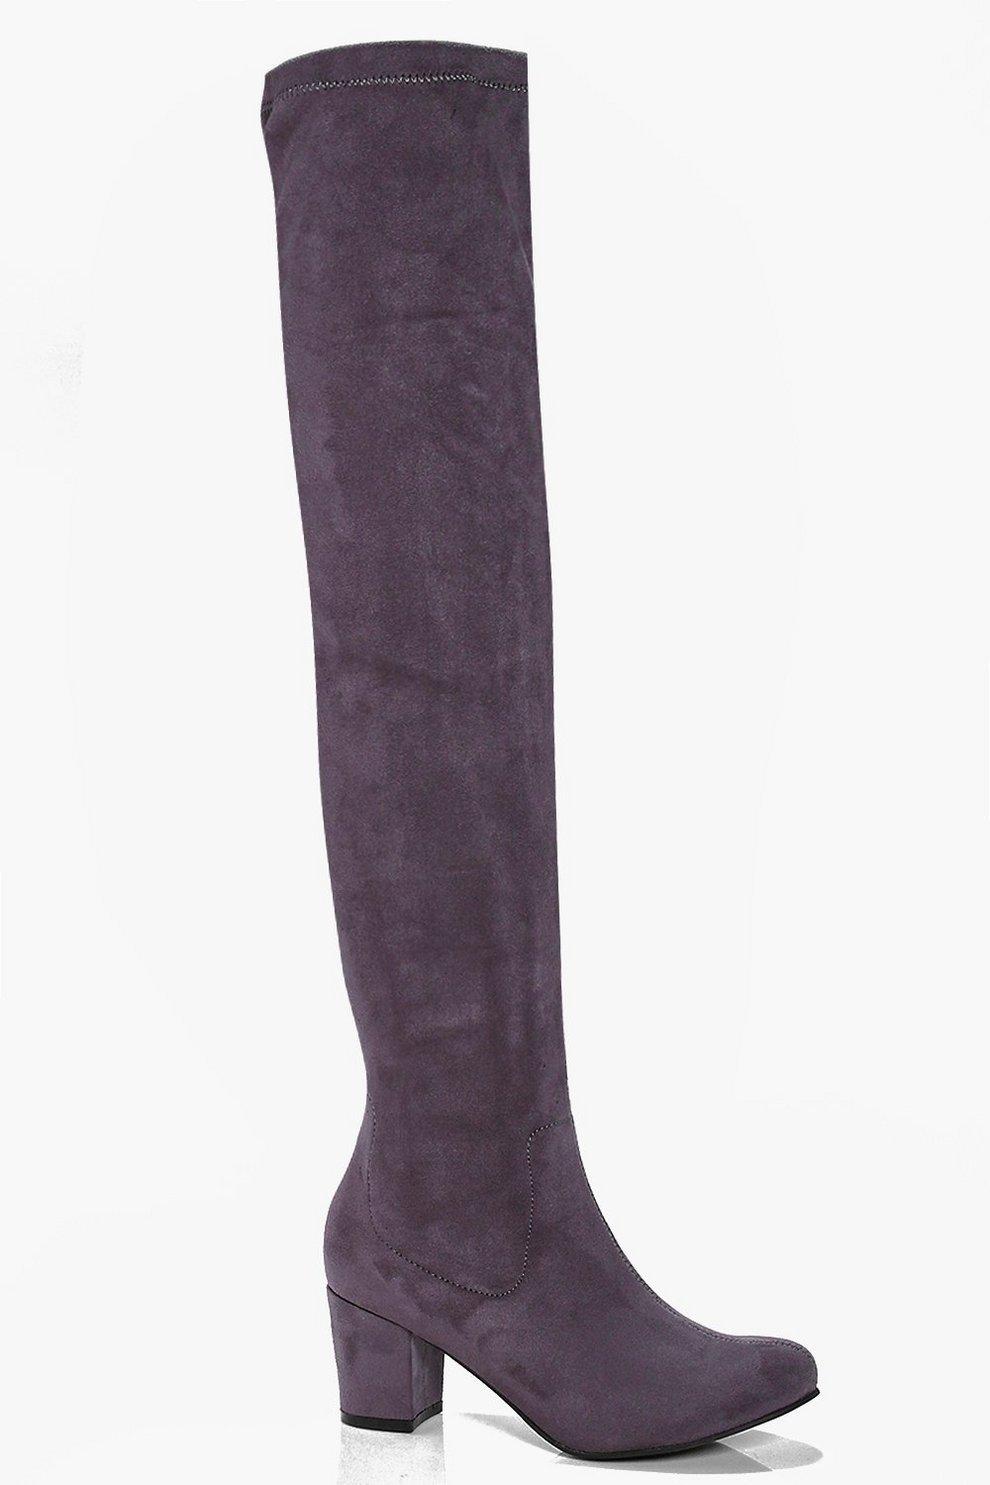 a3bd1db357 Block Heel Stretch Knee High Boots